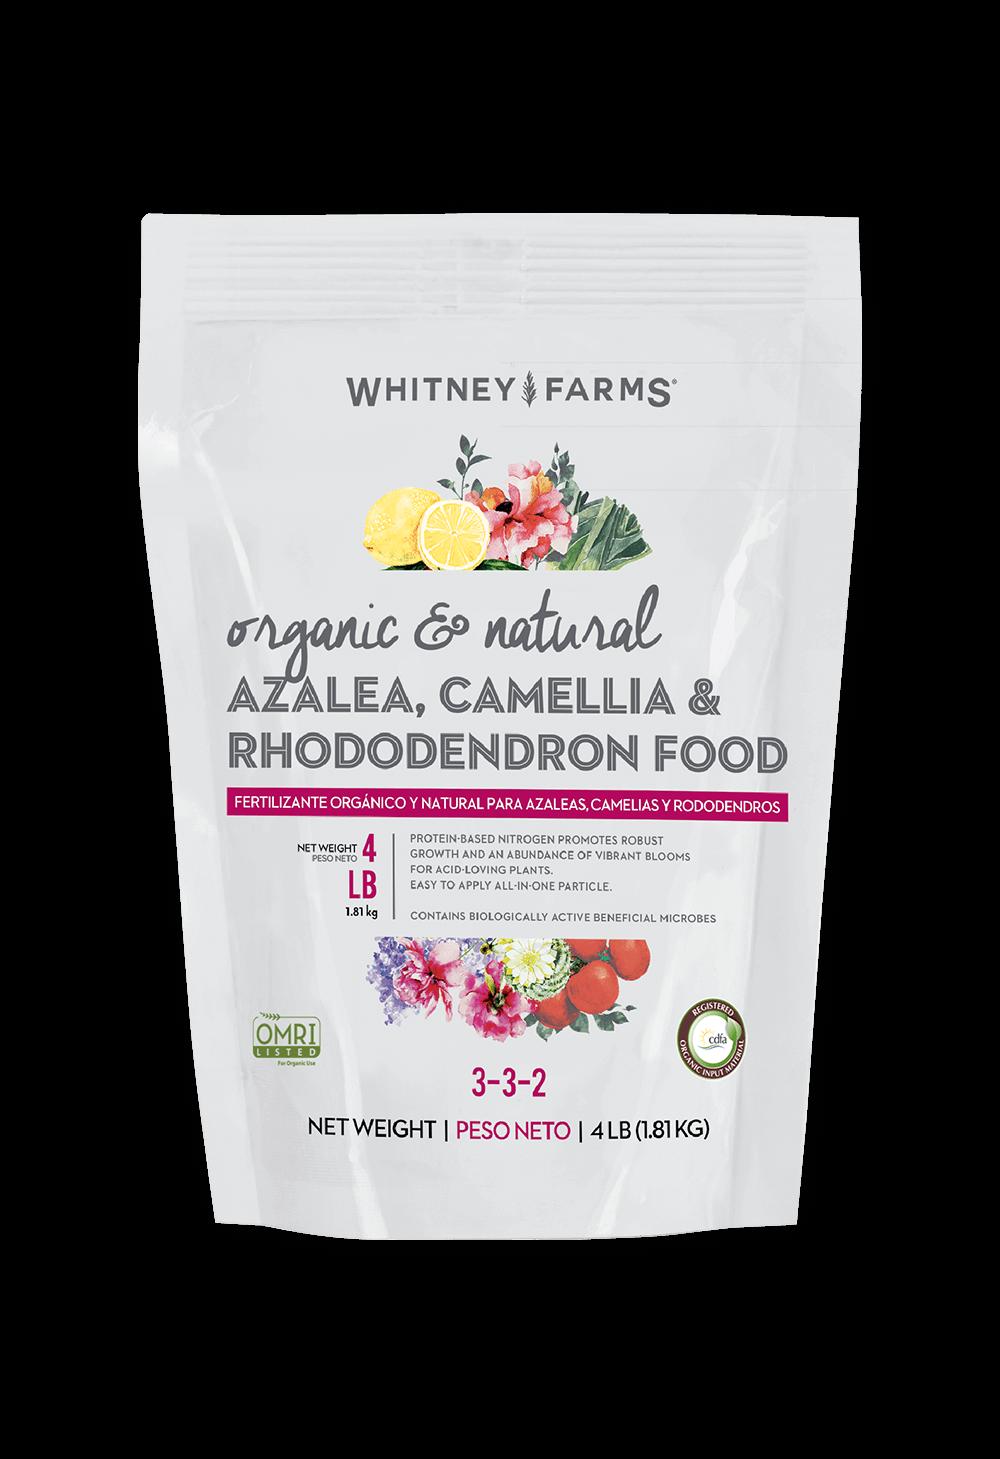 Azalea, Camellia, & Rhododendron Food